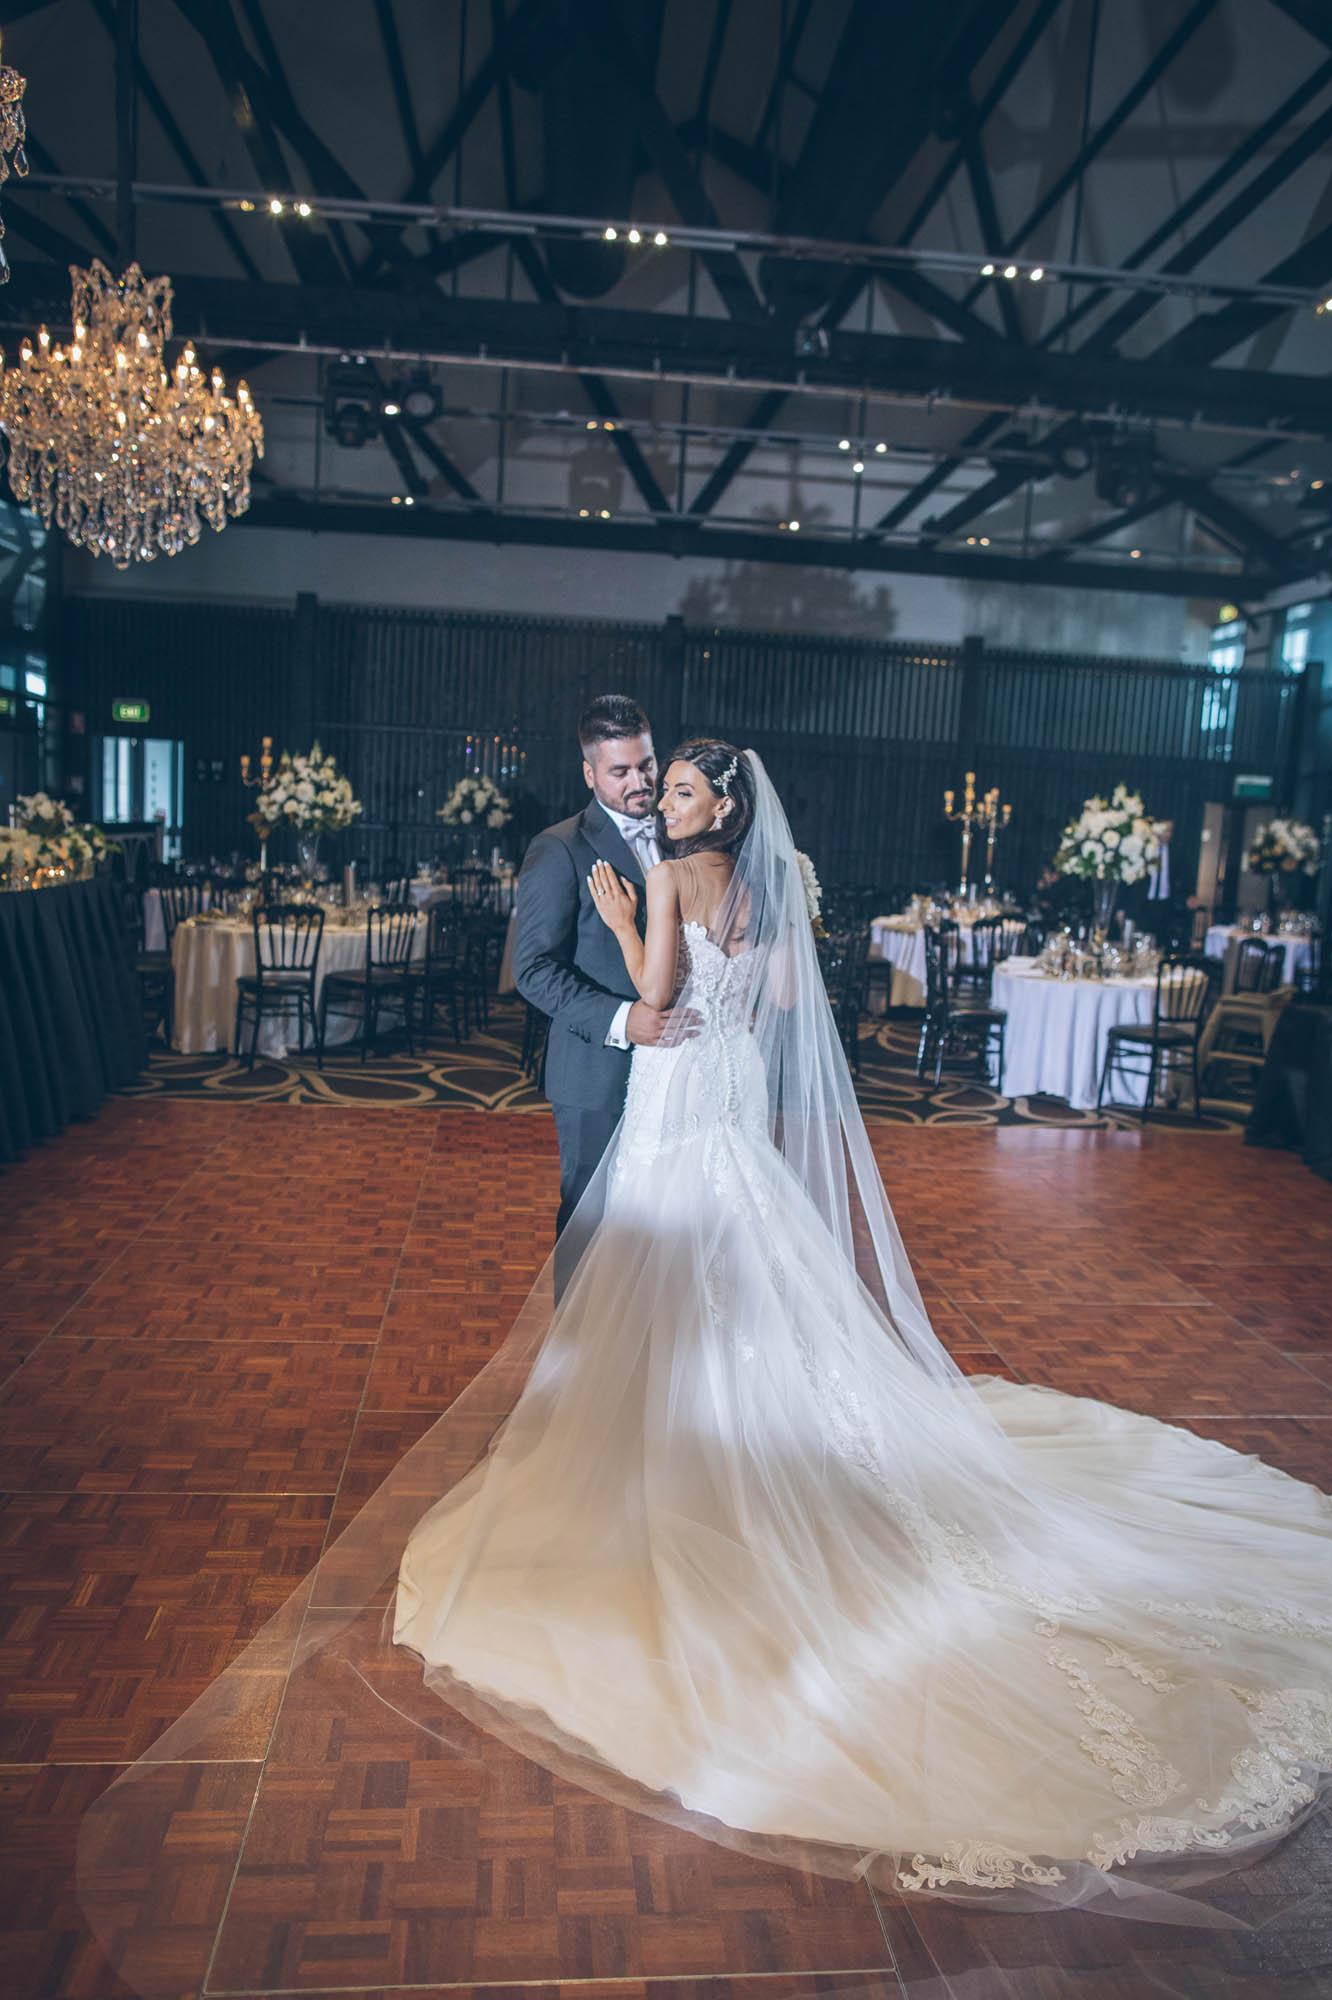 MacDougall-Photography-Sydney-Wedding-Photographers-73.jpg